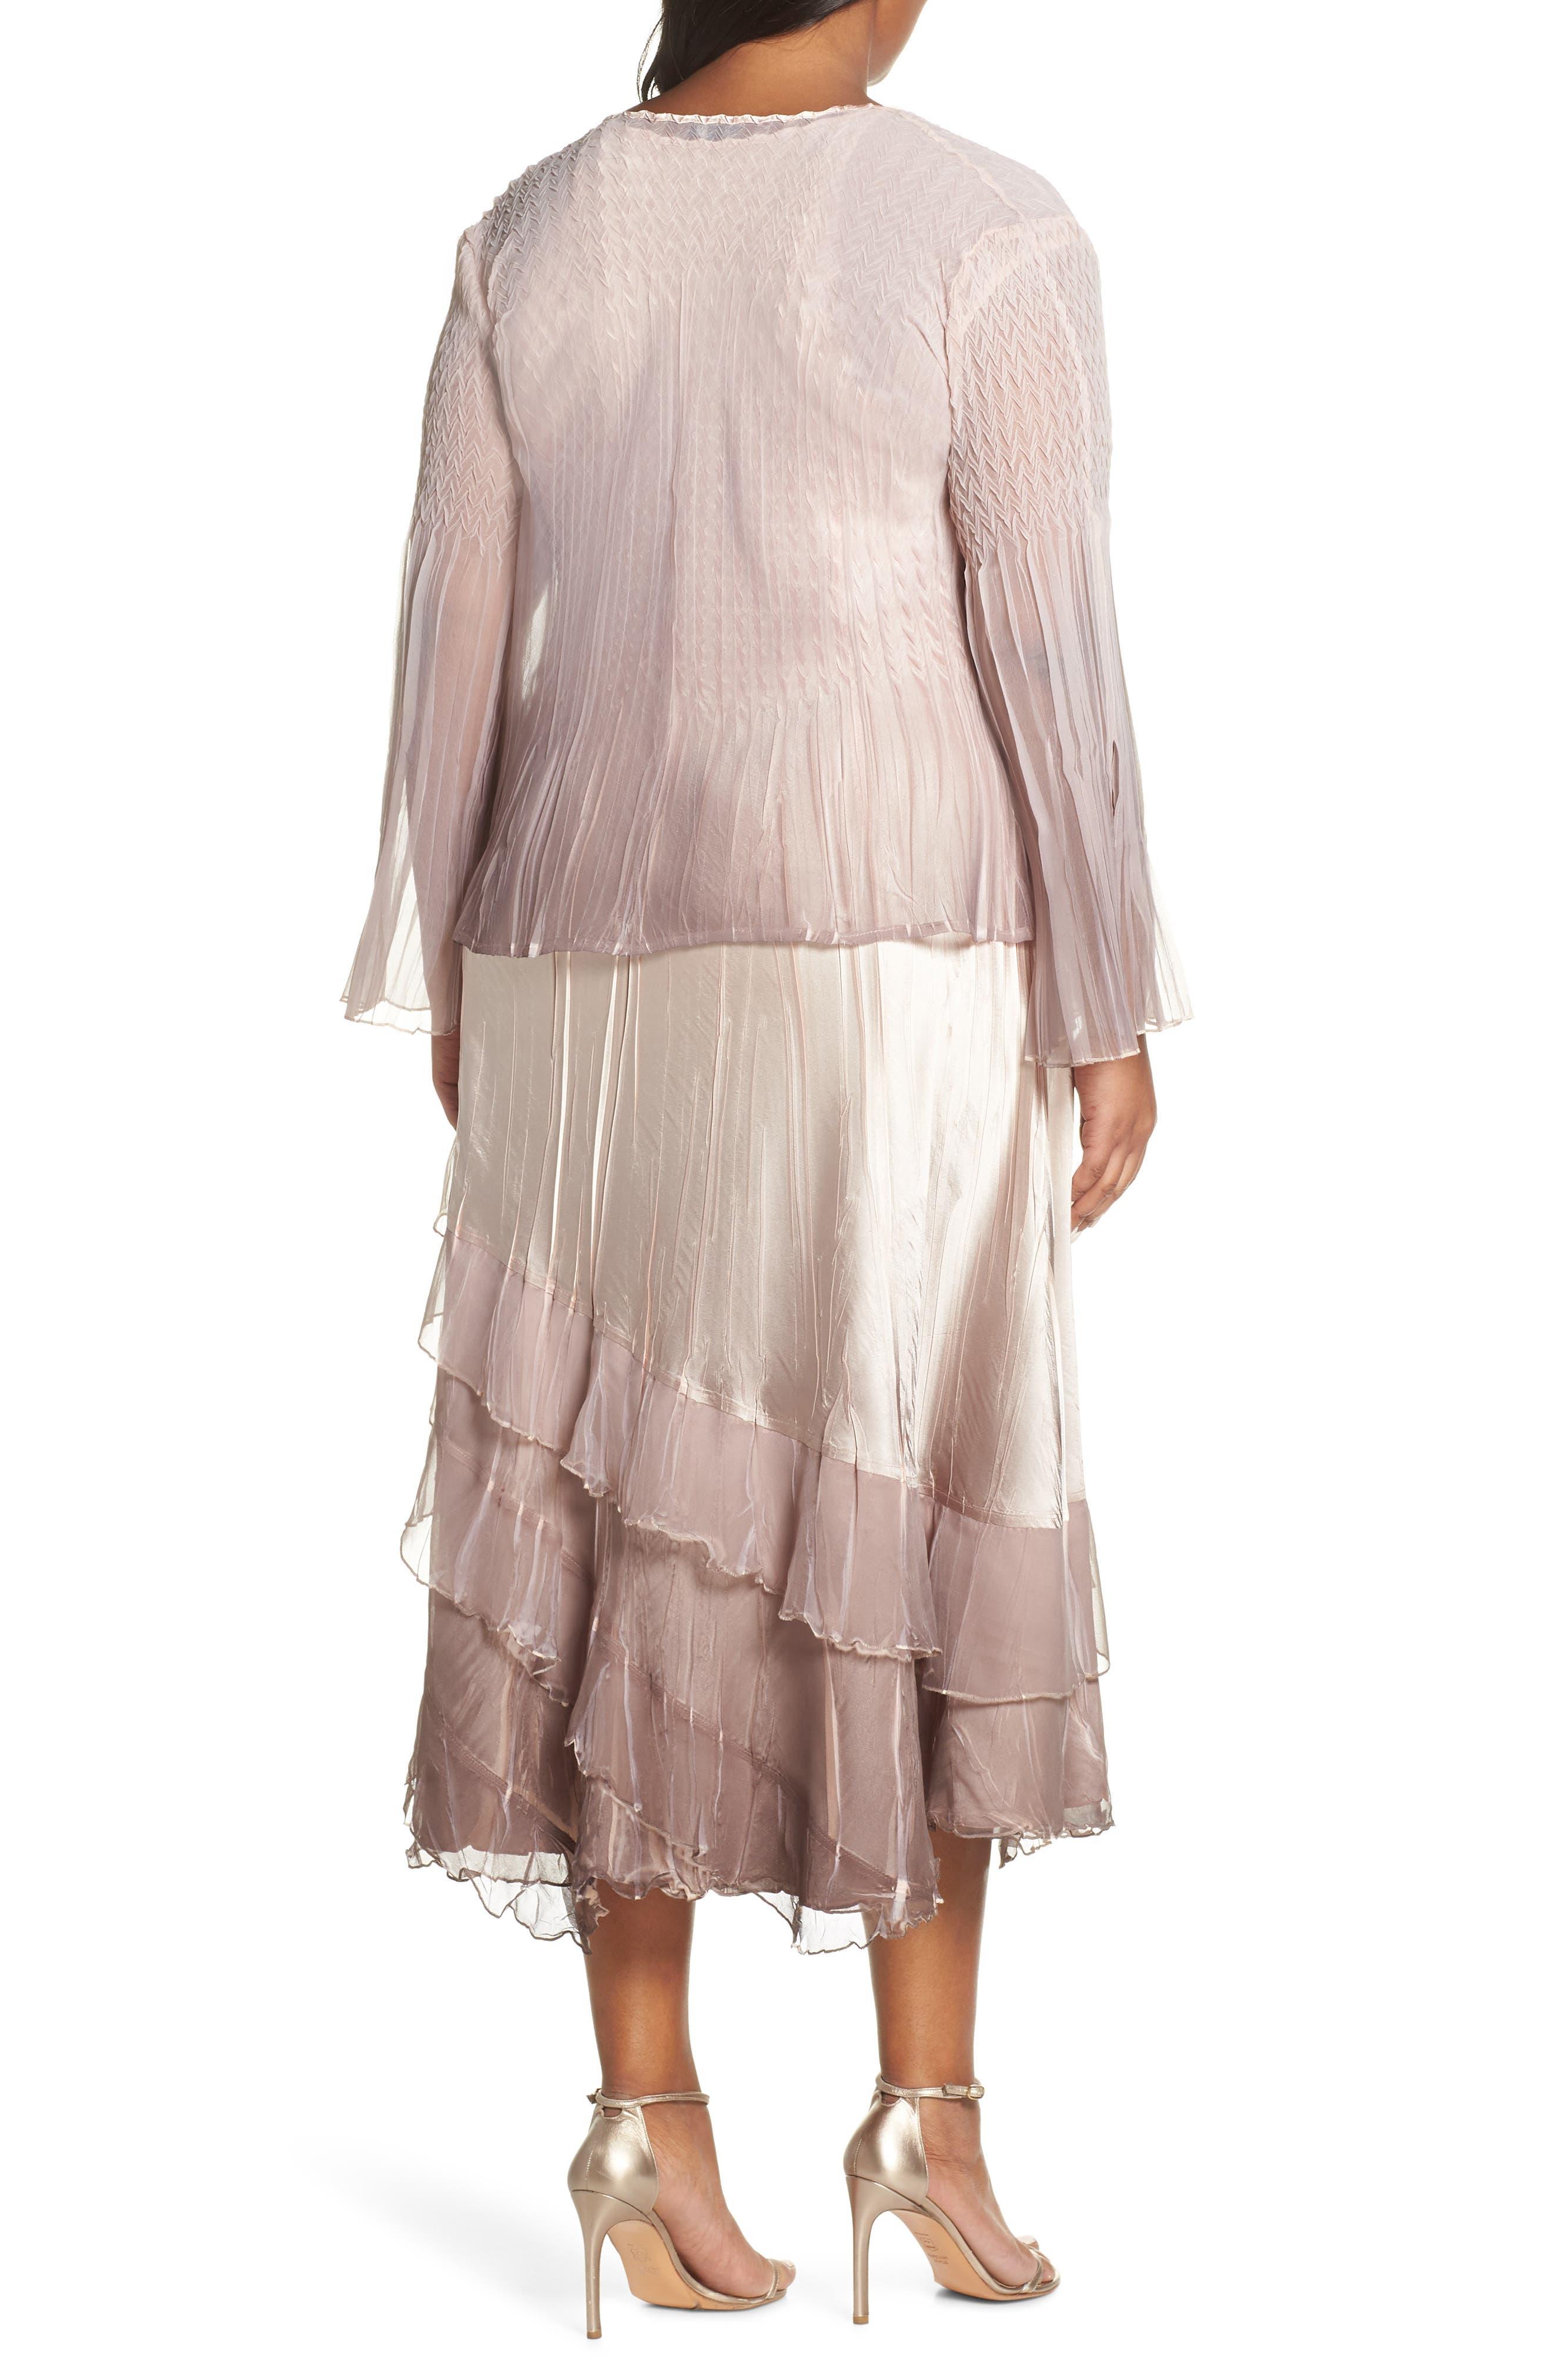 KOMAROV, Tiered Hem Ombré Dress with Jacket, Alternate thumbnail 2, color, VINTAGE ROSE WITH CAFE OMBRE